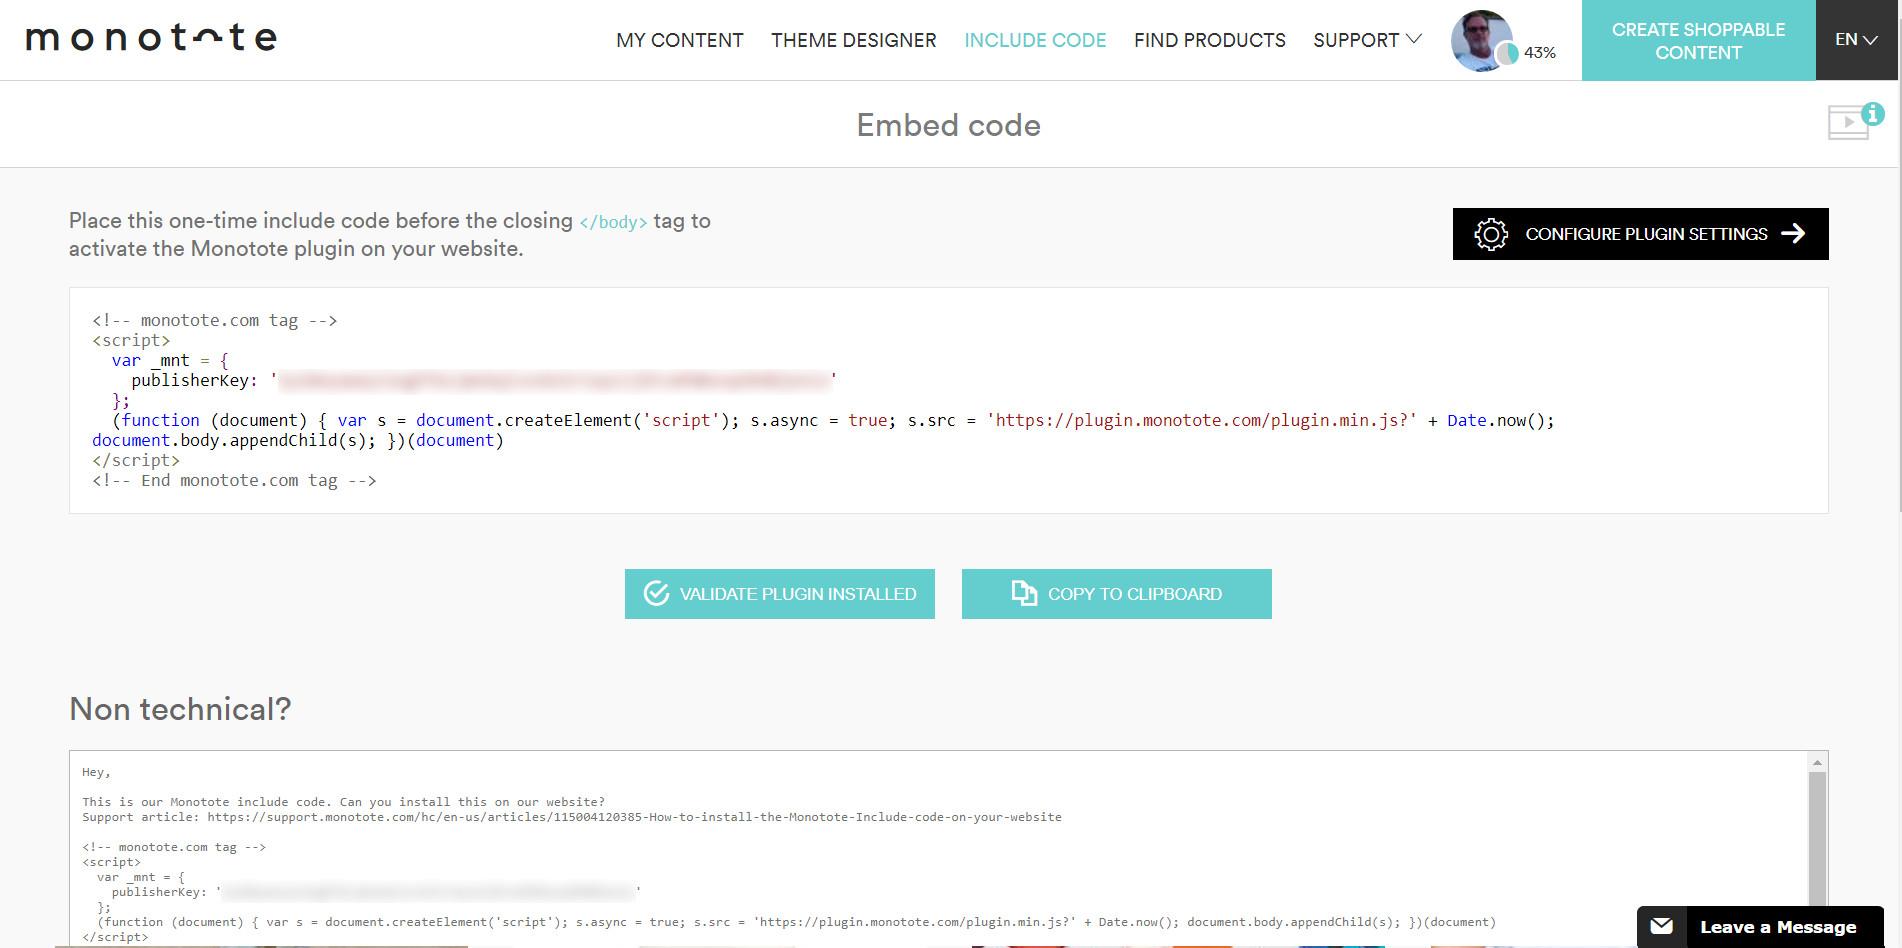 Monotote dashboard embed code